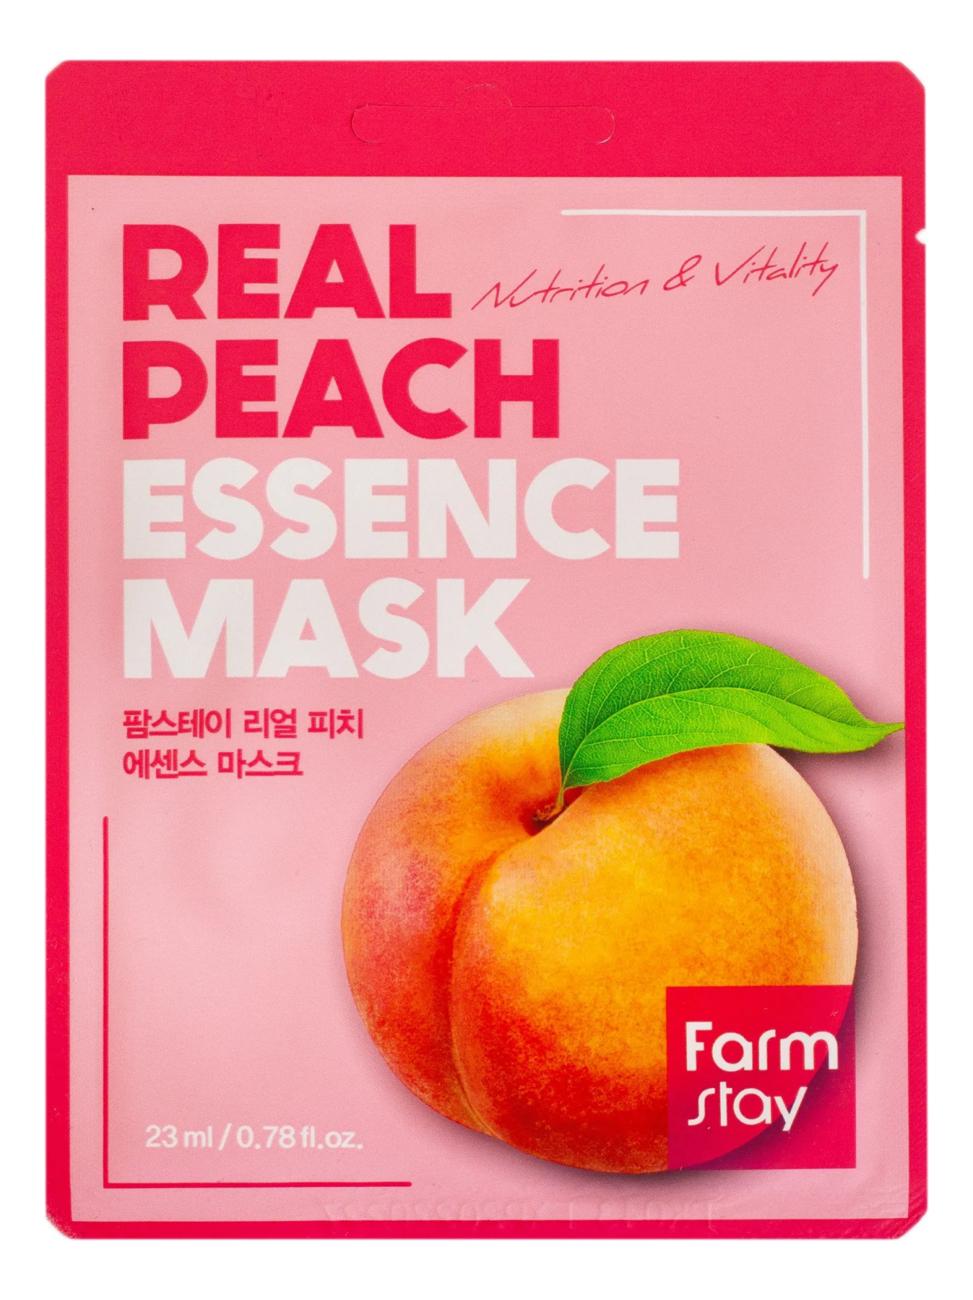 Тканевая маска для лица с экстрактом персика Real Peach Essence Mask 23мл: Маска 1шт farmstay тканевая маска для лица с экстрактом персика real peach essence mask 23 мл